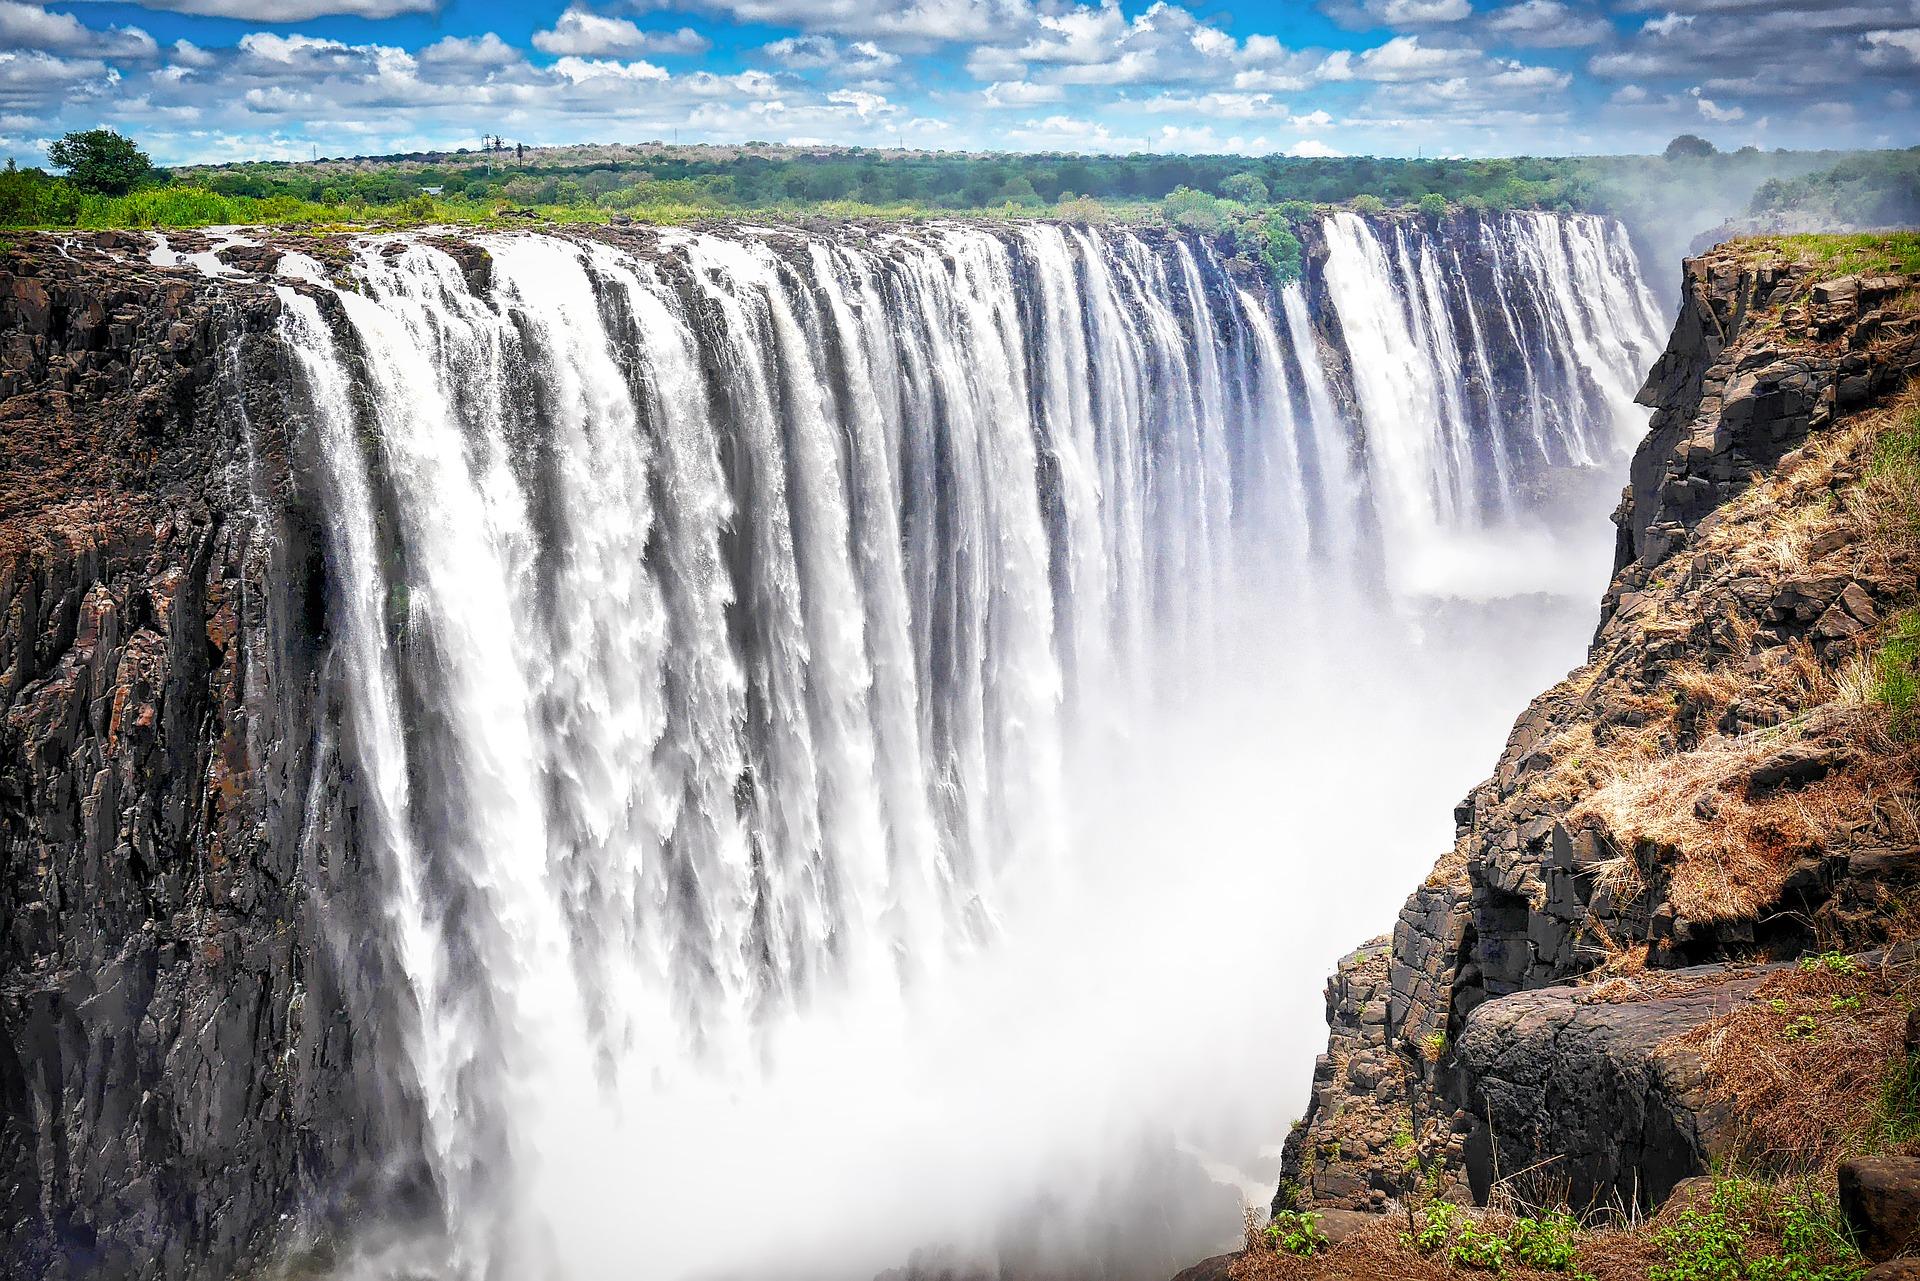 https://www.safariventures.com/wp-content/uploads/2019/01/africa-2960532_1920.jpg